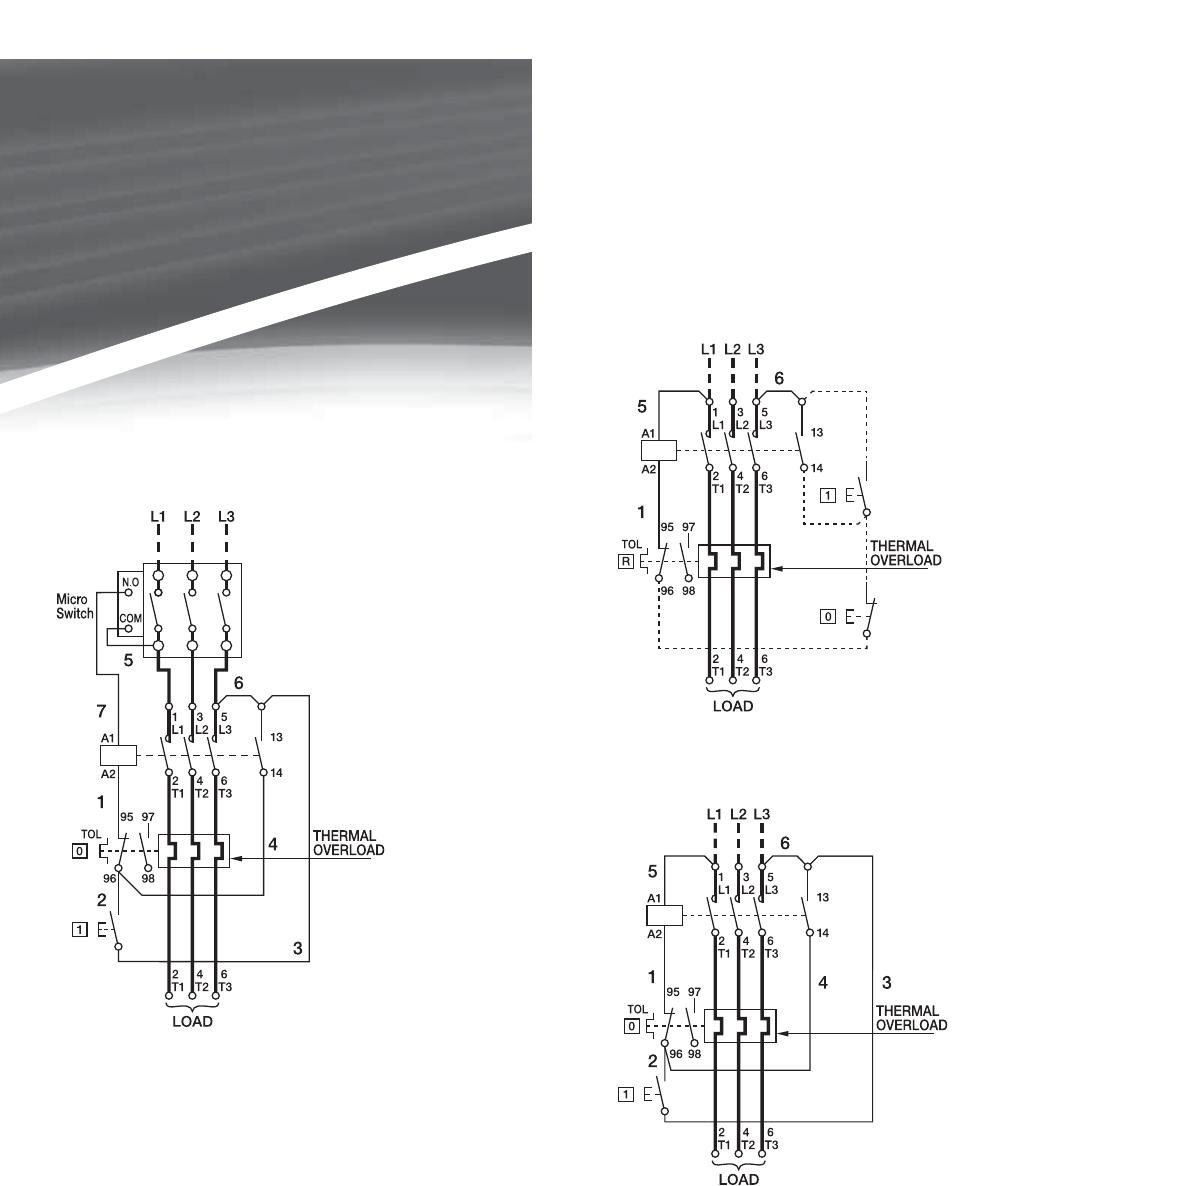 wiring diagram for motor starter installation instructions motor starter wiring diagrams 16231 3 phase  motor starter wiring diagrams 16231 3 phase